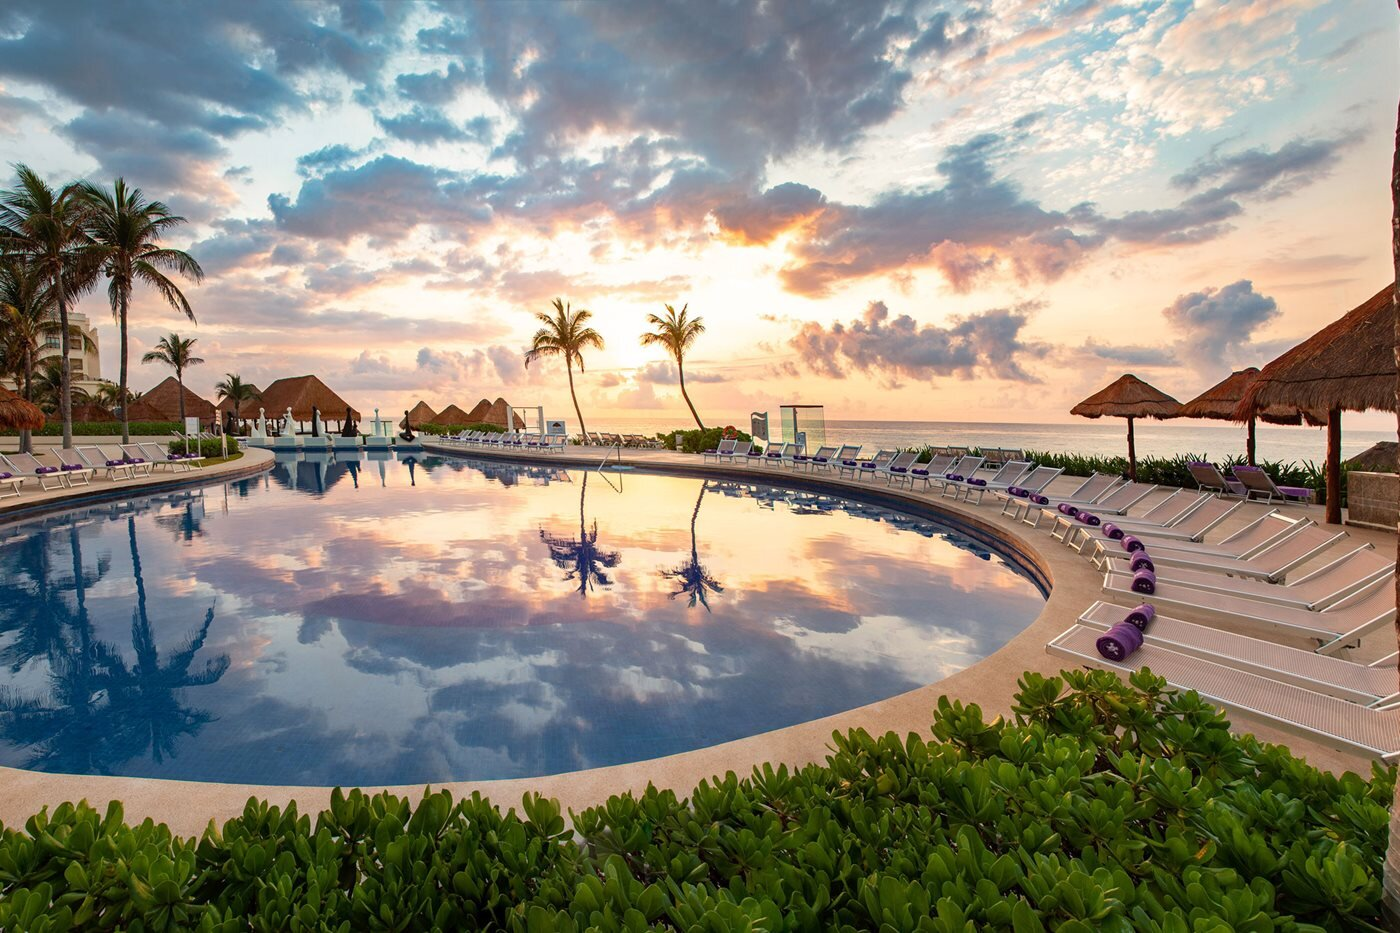 Paradisus Cancun Cancun, Mexico pool sunset